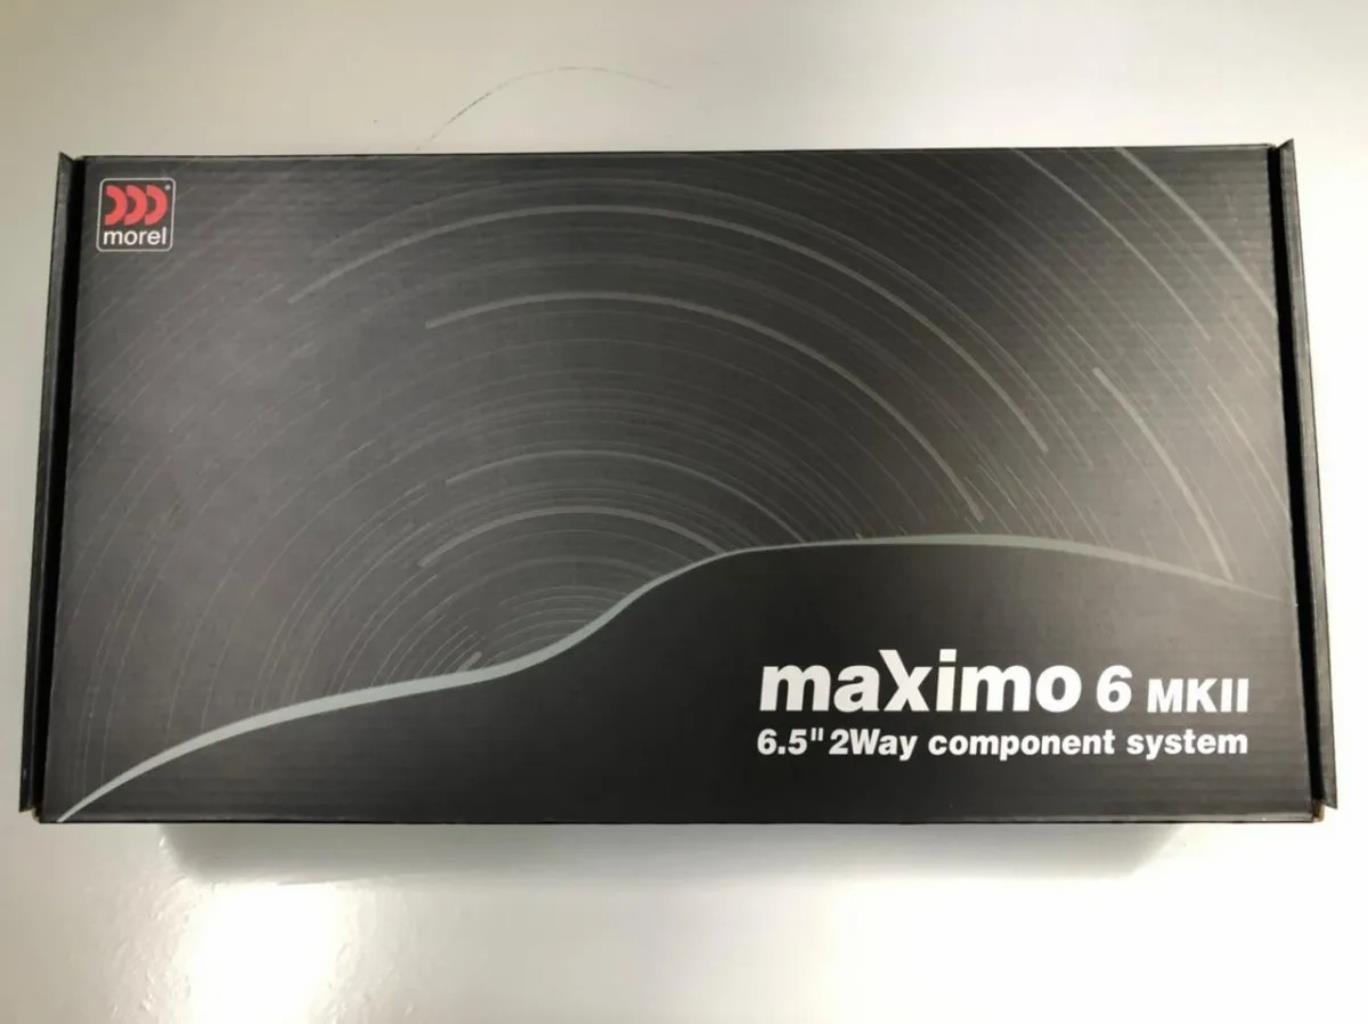 "Morel Maximo 6 MK2 - kit 2 vias de 6"" (90w Rms @ 4ohm)"